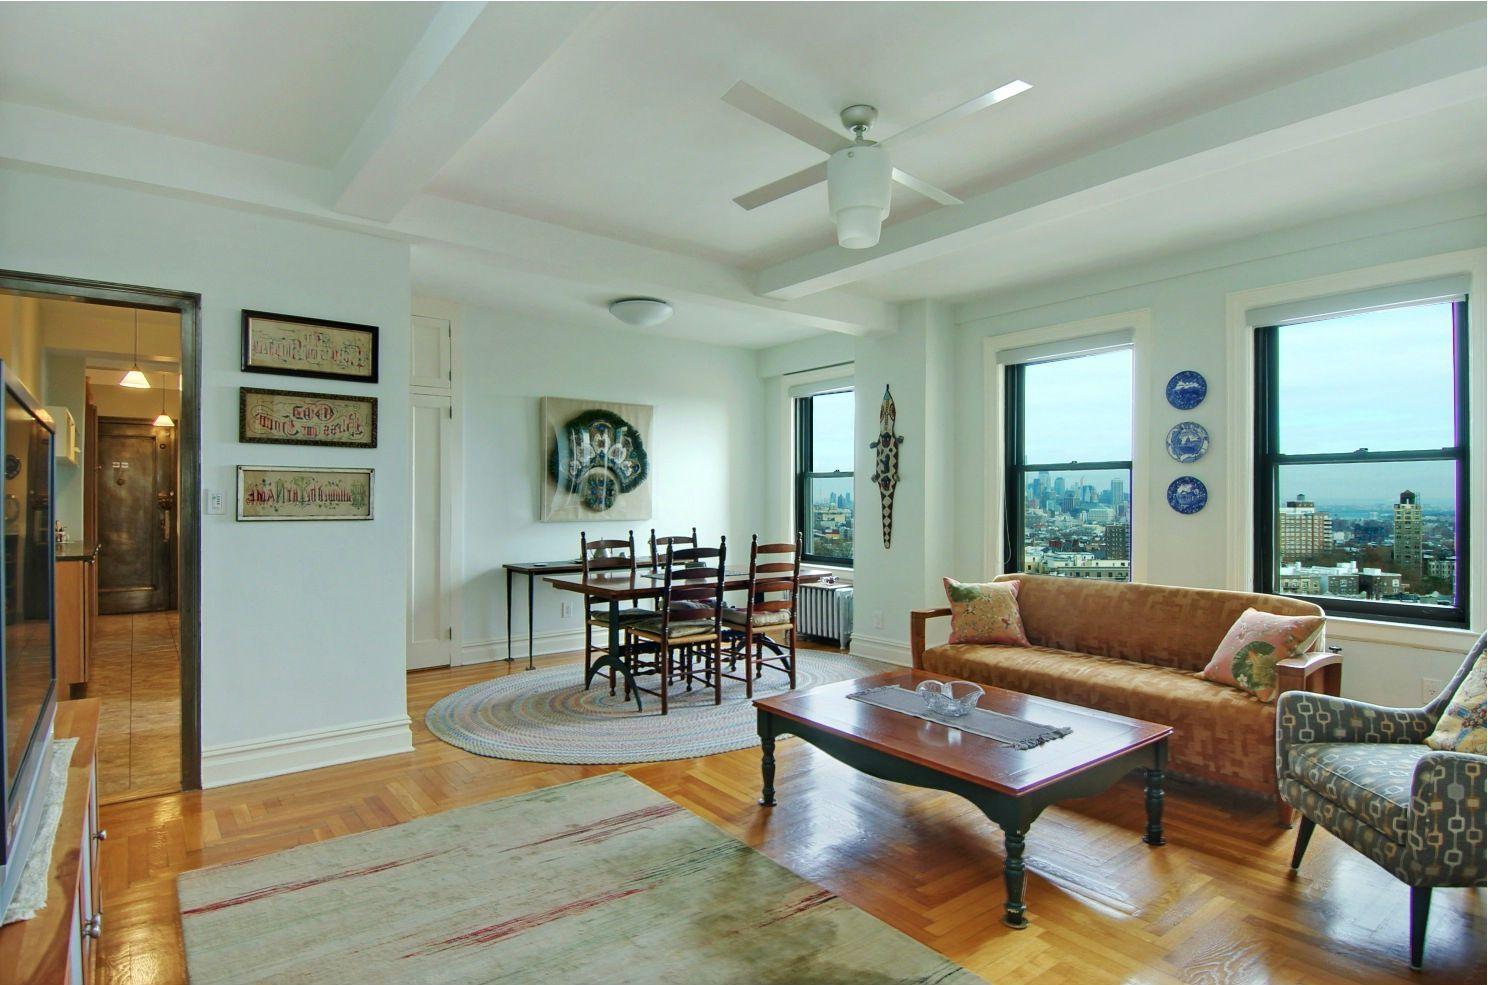 Middle Eastern Living Room Ideas With Mosaics   DesignForLifeu0027s Portfolio